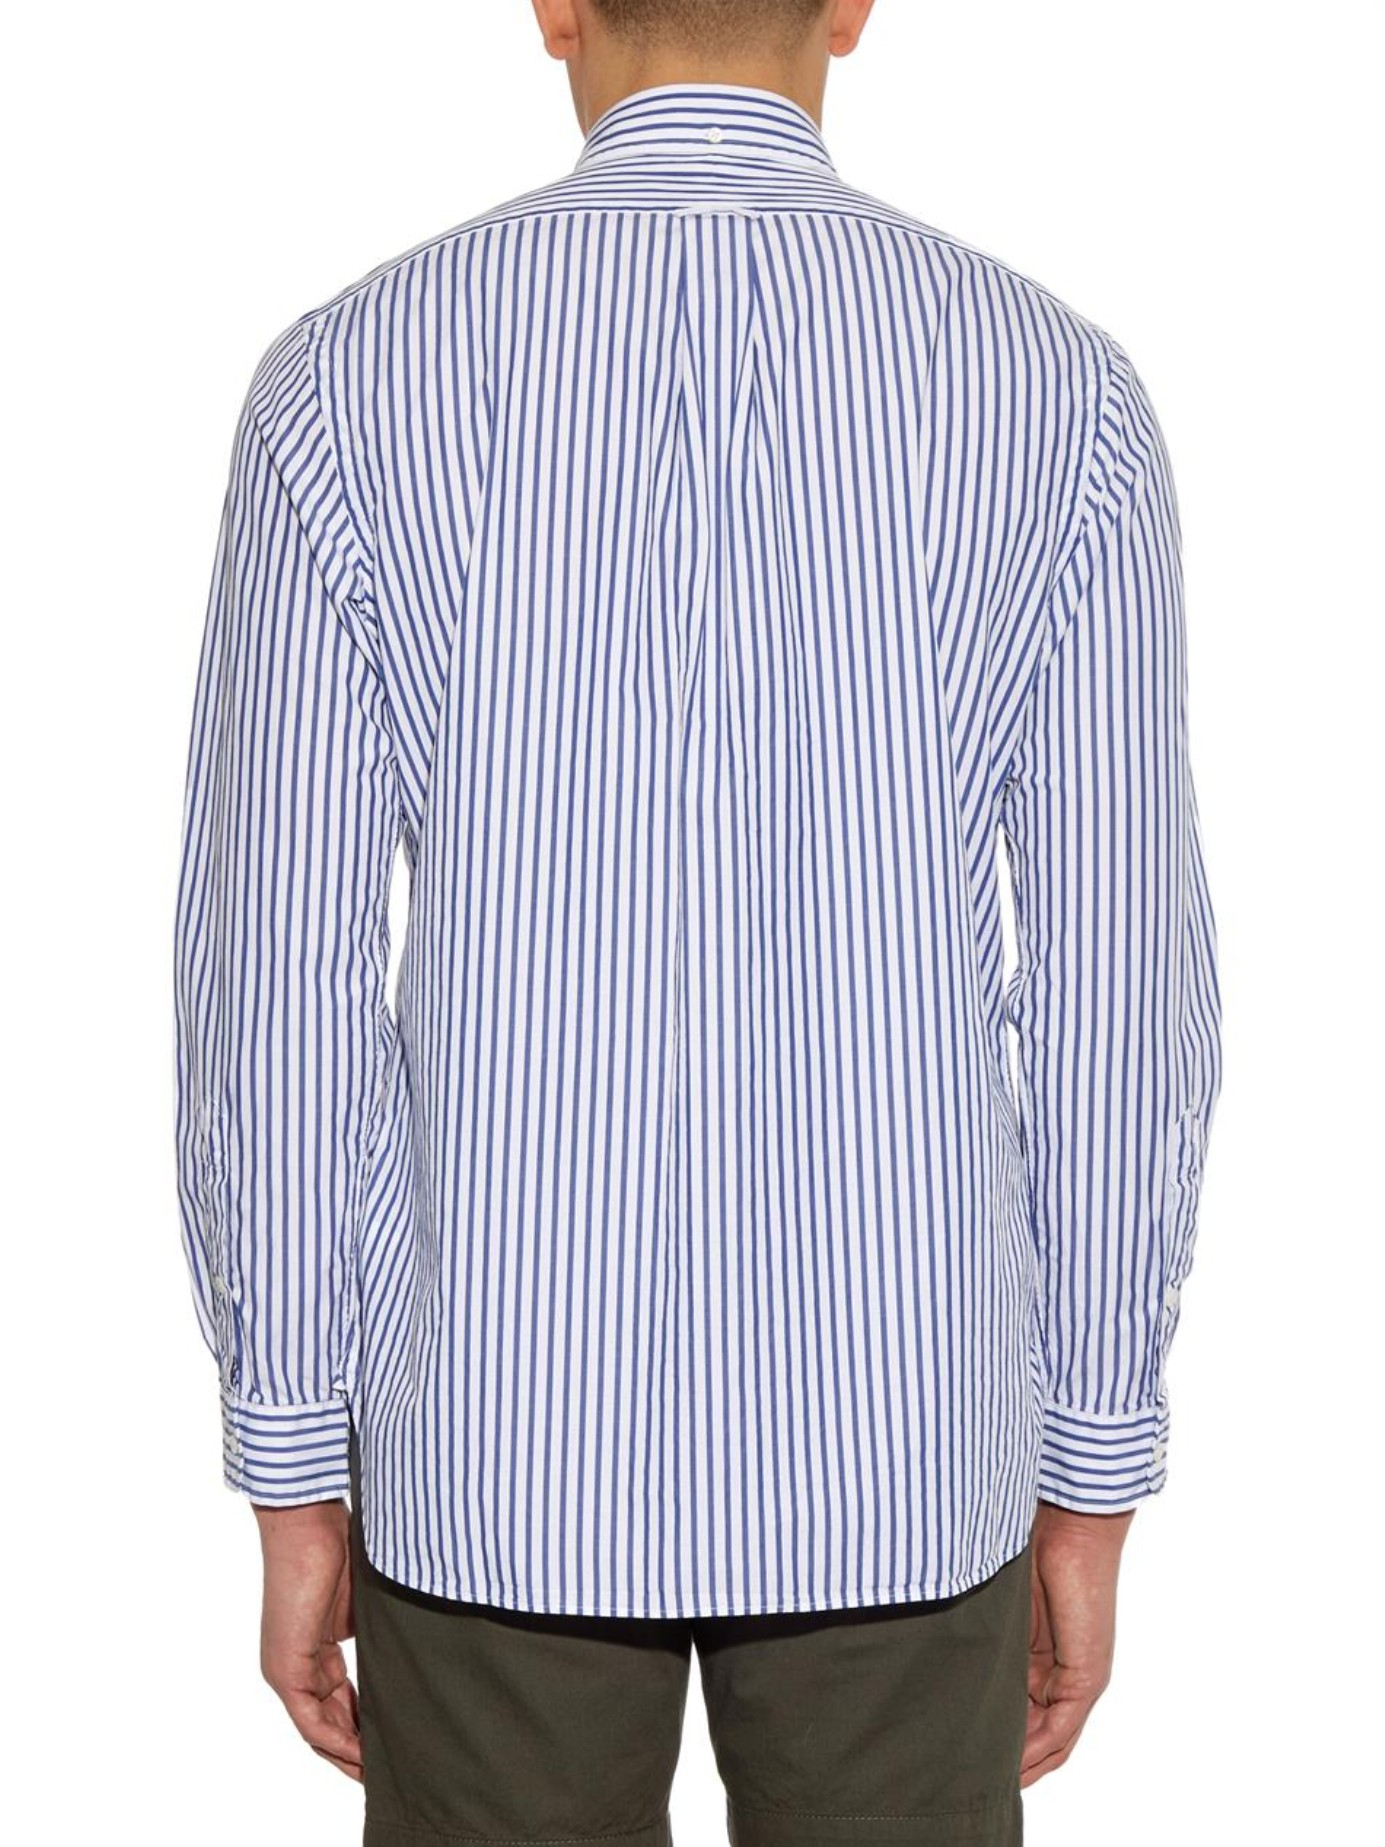 d503ca93870 Polo Ralph Lauren Custom-fit Striped Cotton Shirt in Blue for Men - Lyst